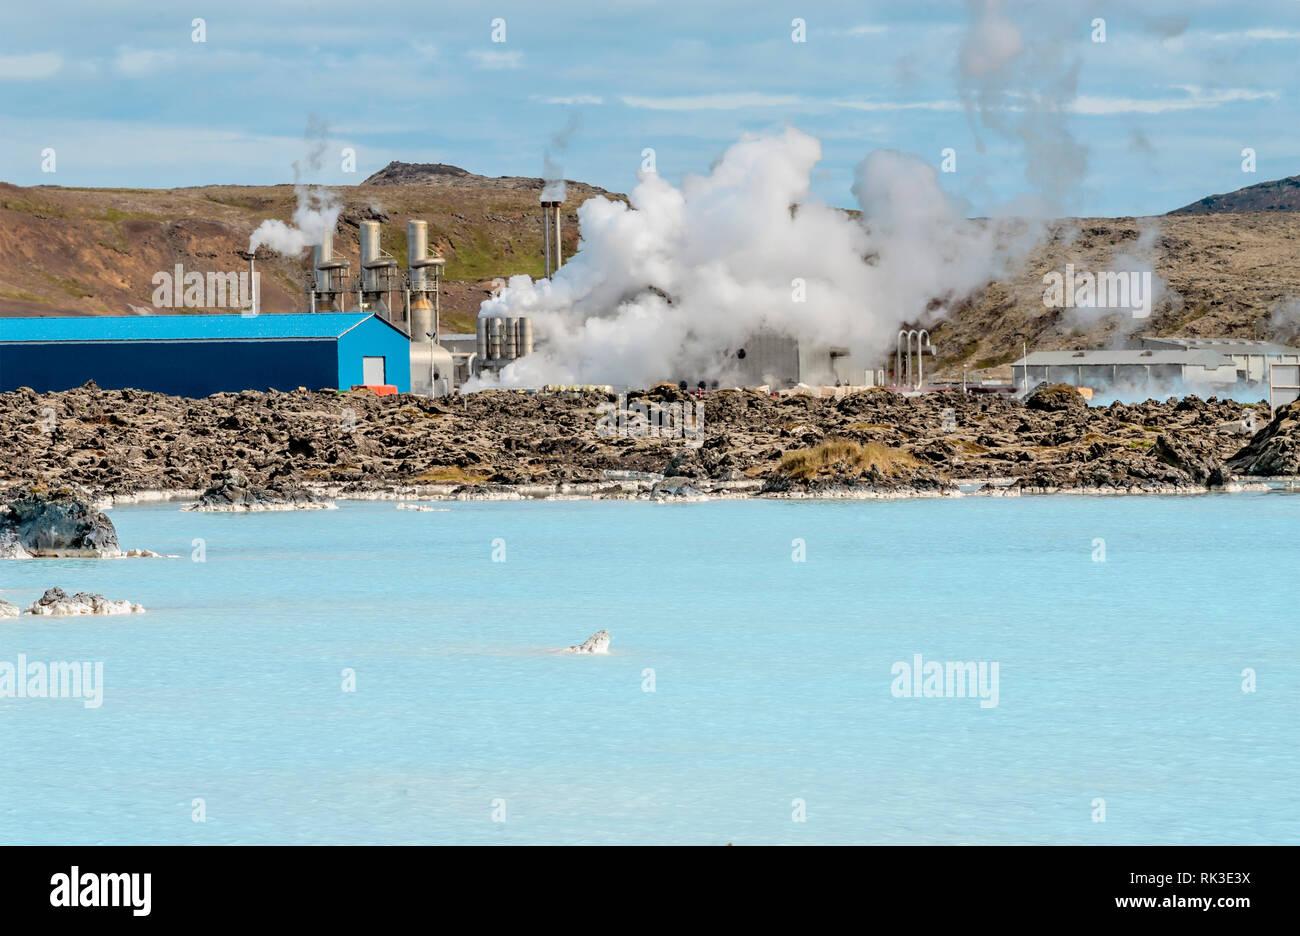 Erdwaerme Kraftwerk an der Blue Lagoon, Island   Geothermal power station at the Blue Lagoon, Iceland - Stock Image